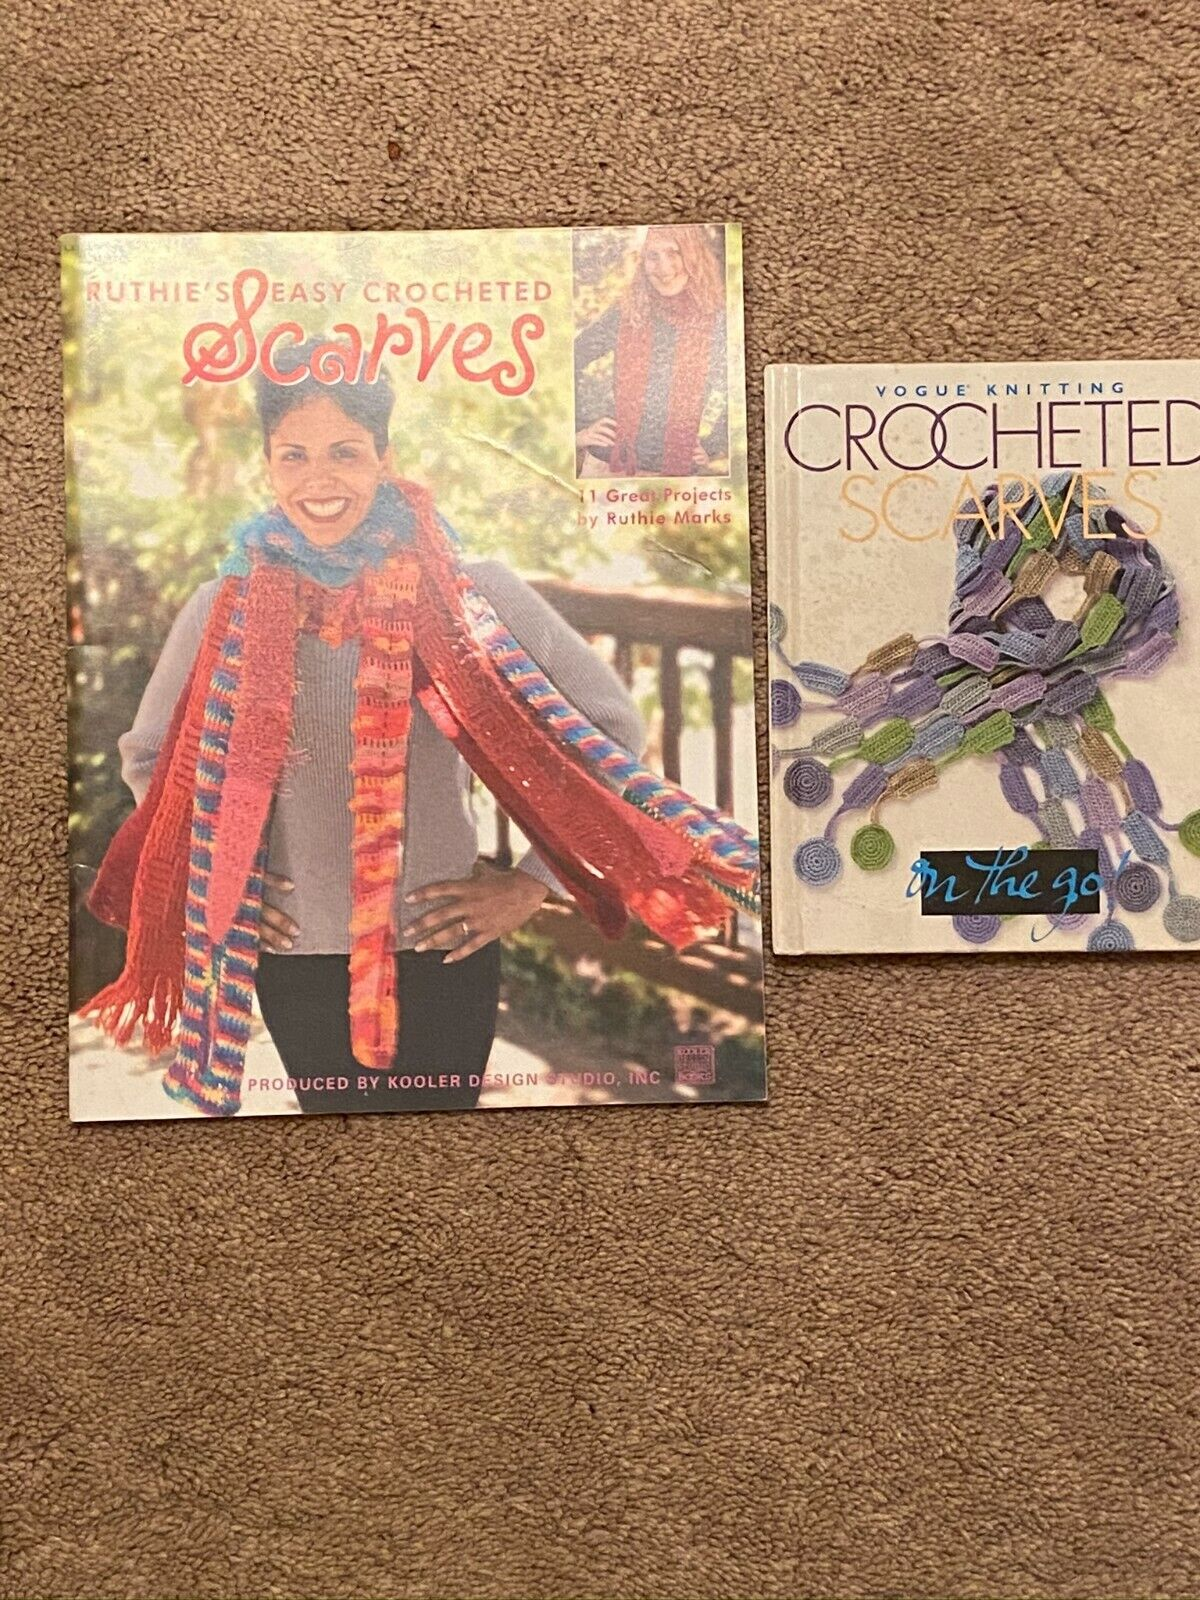 2 Vintage Crochet Scarf Pattern Book Booklet --Lot 1 - $2.64